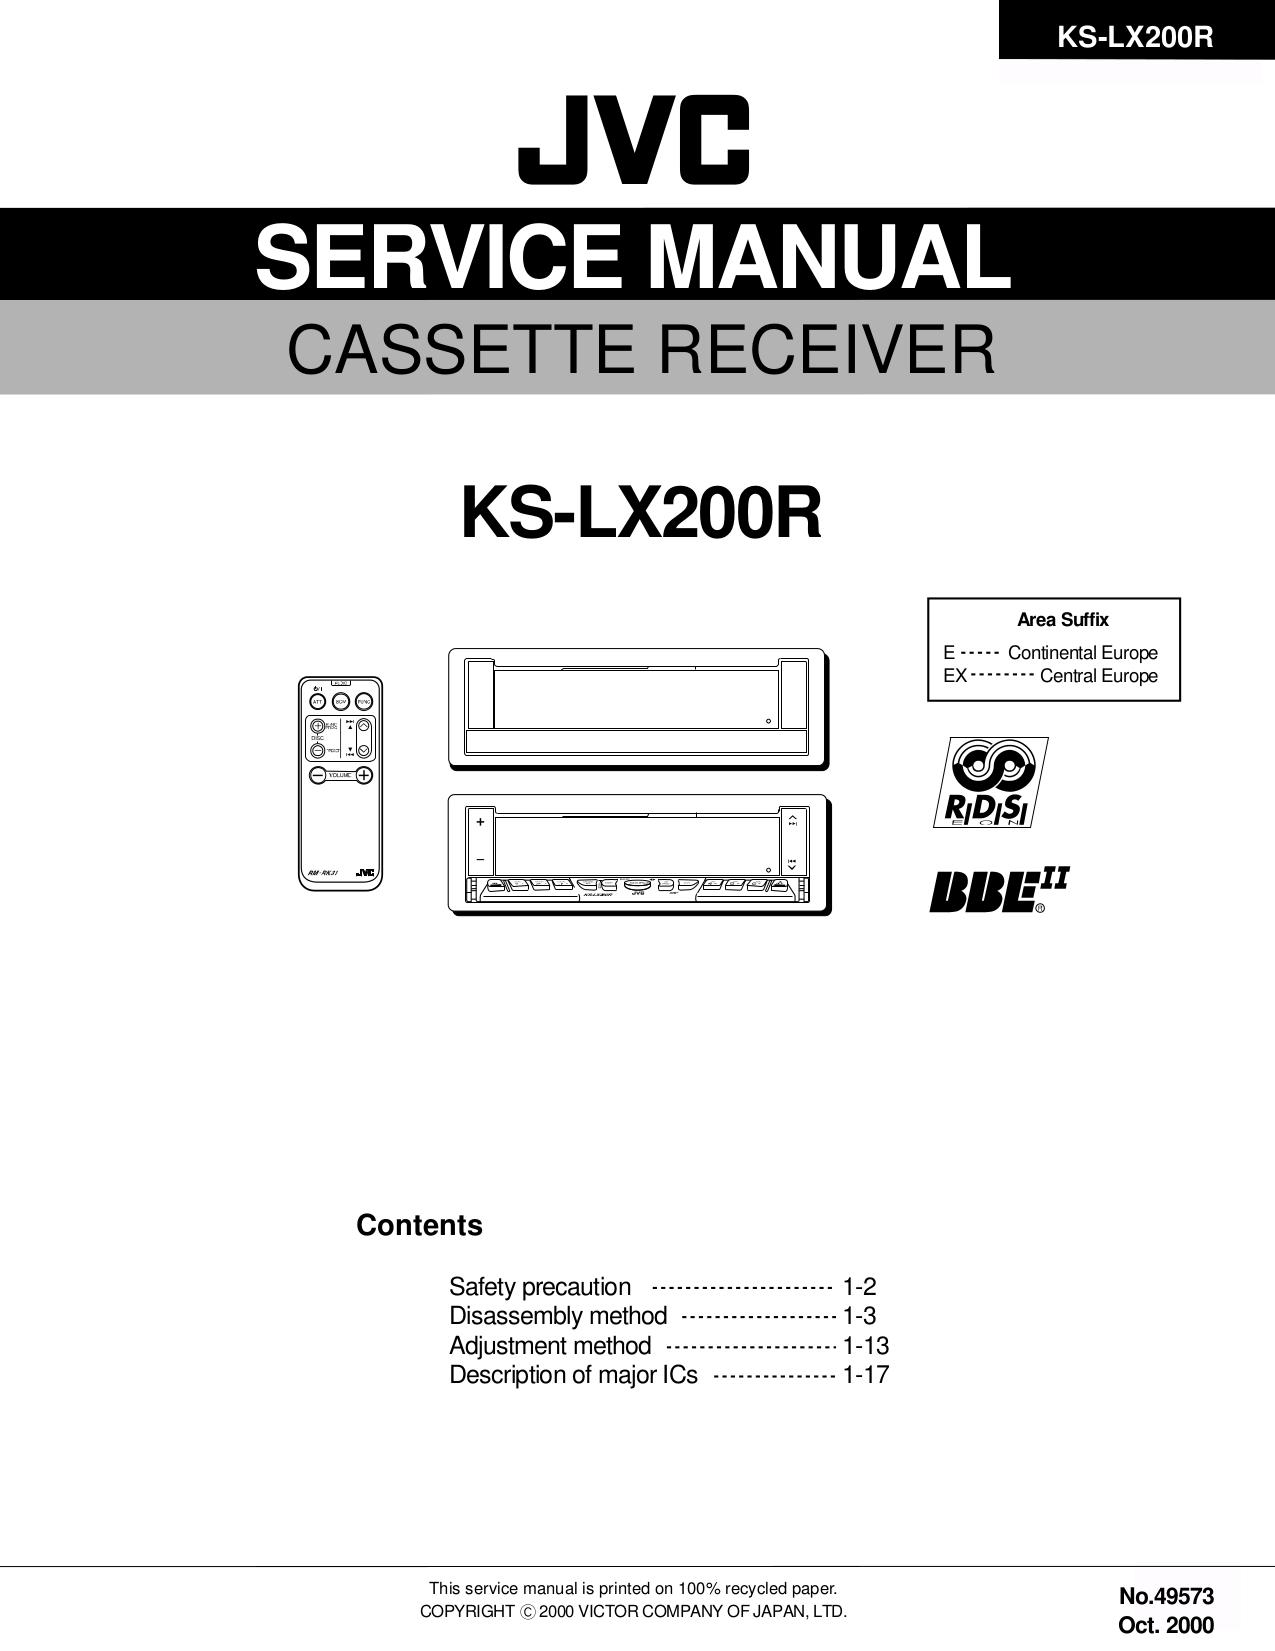 Jvc kd-s641 manuals.